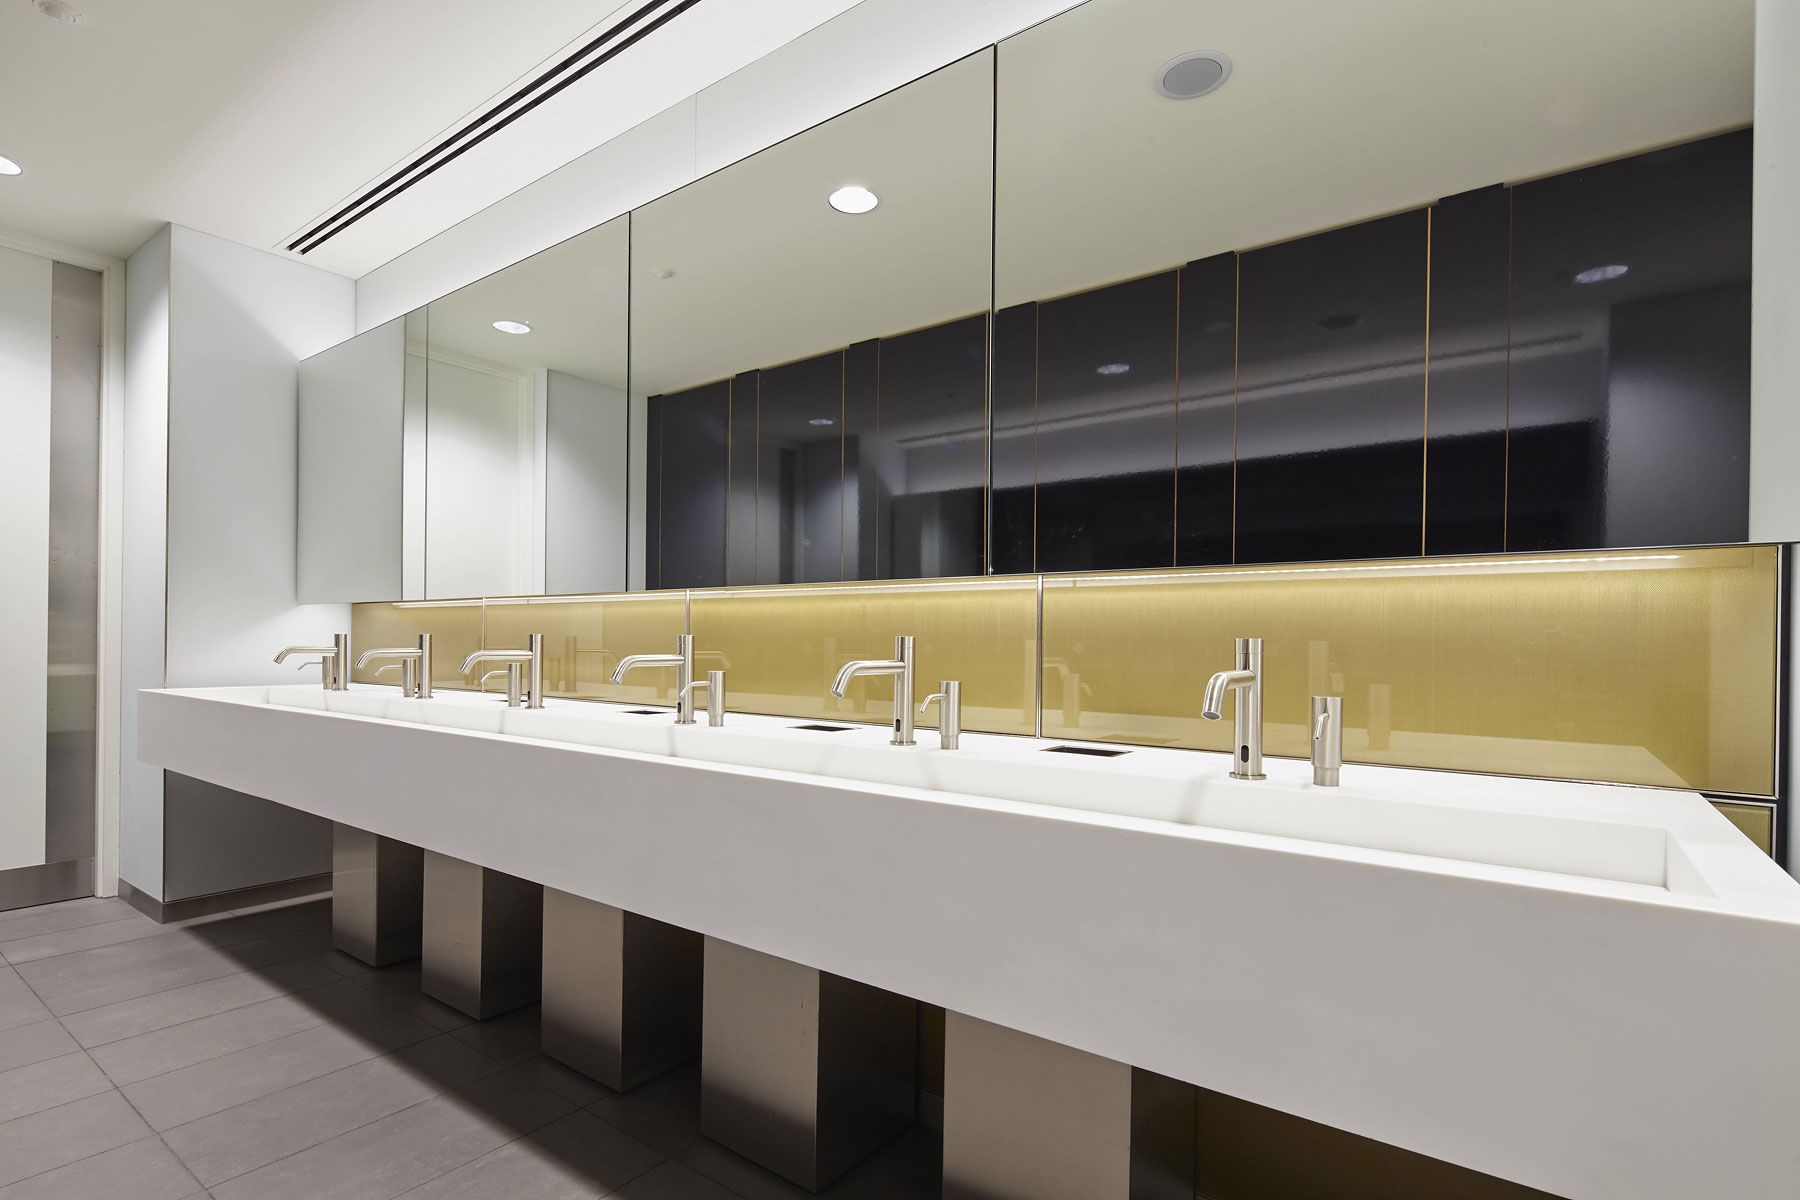 office washroom design. About Us | Maxwood Washrooms Office Washroom Design